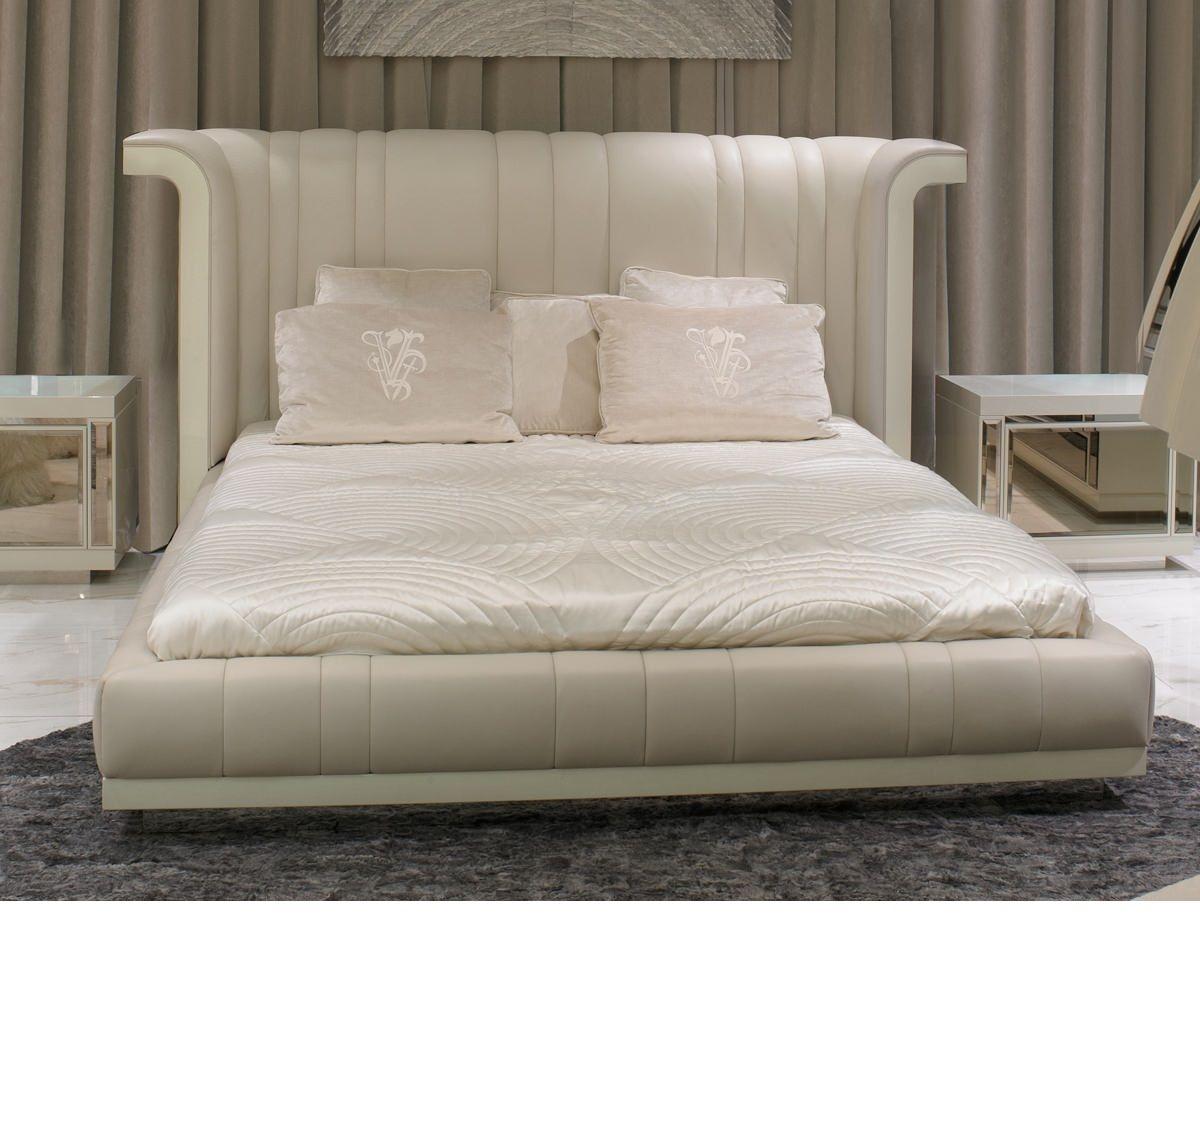 Luxury Bedrooms Luxury Bedroom Furniture Designer Bedroom Furniture By Instyle Decor Com Holl Upscale Furniture Luxury Bedroom Furniture Luxury Furniture